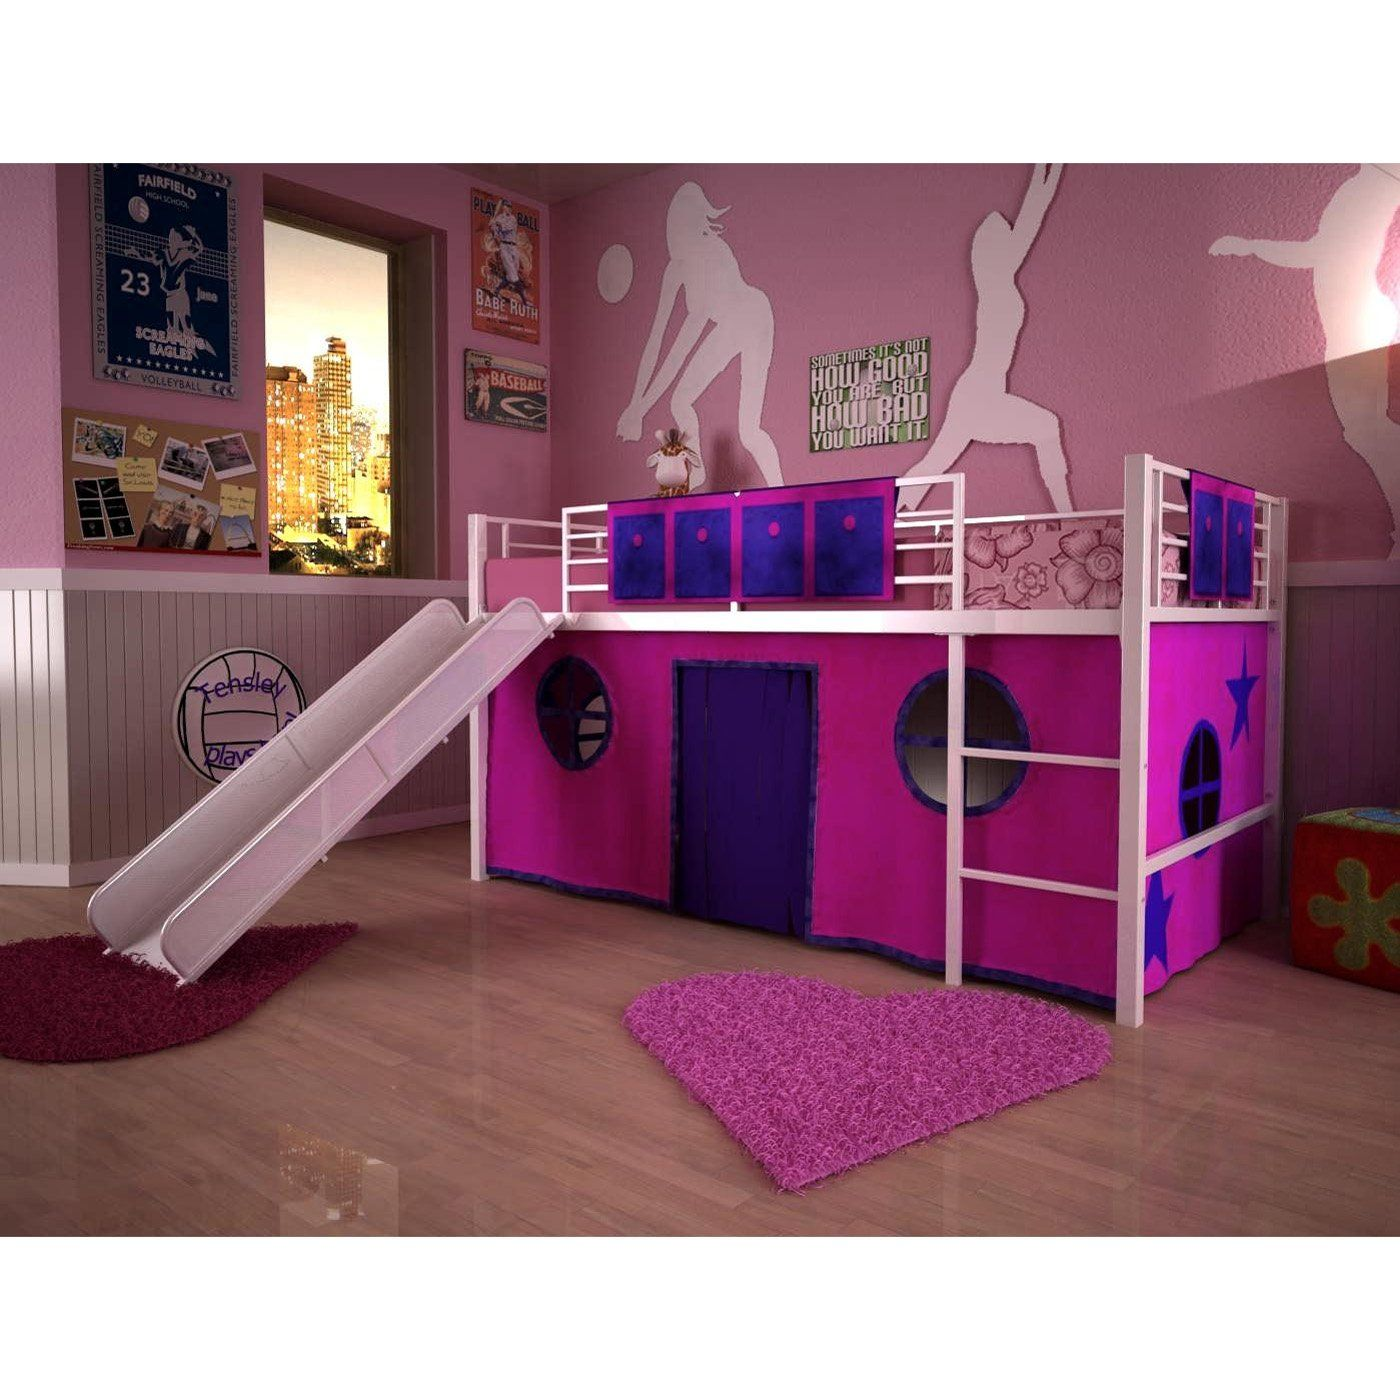 Girls loft bed with stairs  pinkloftbedsforteenagersloftbedsforteenagegirlspbteen